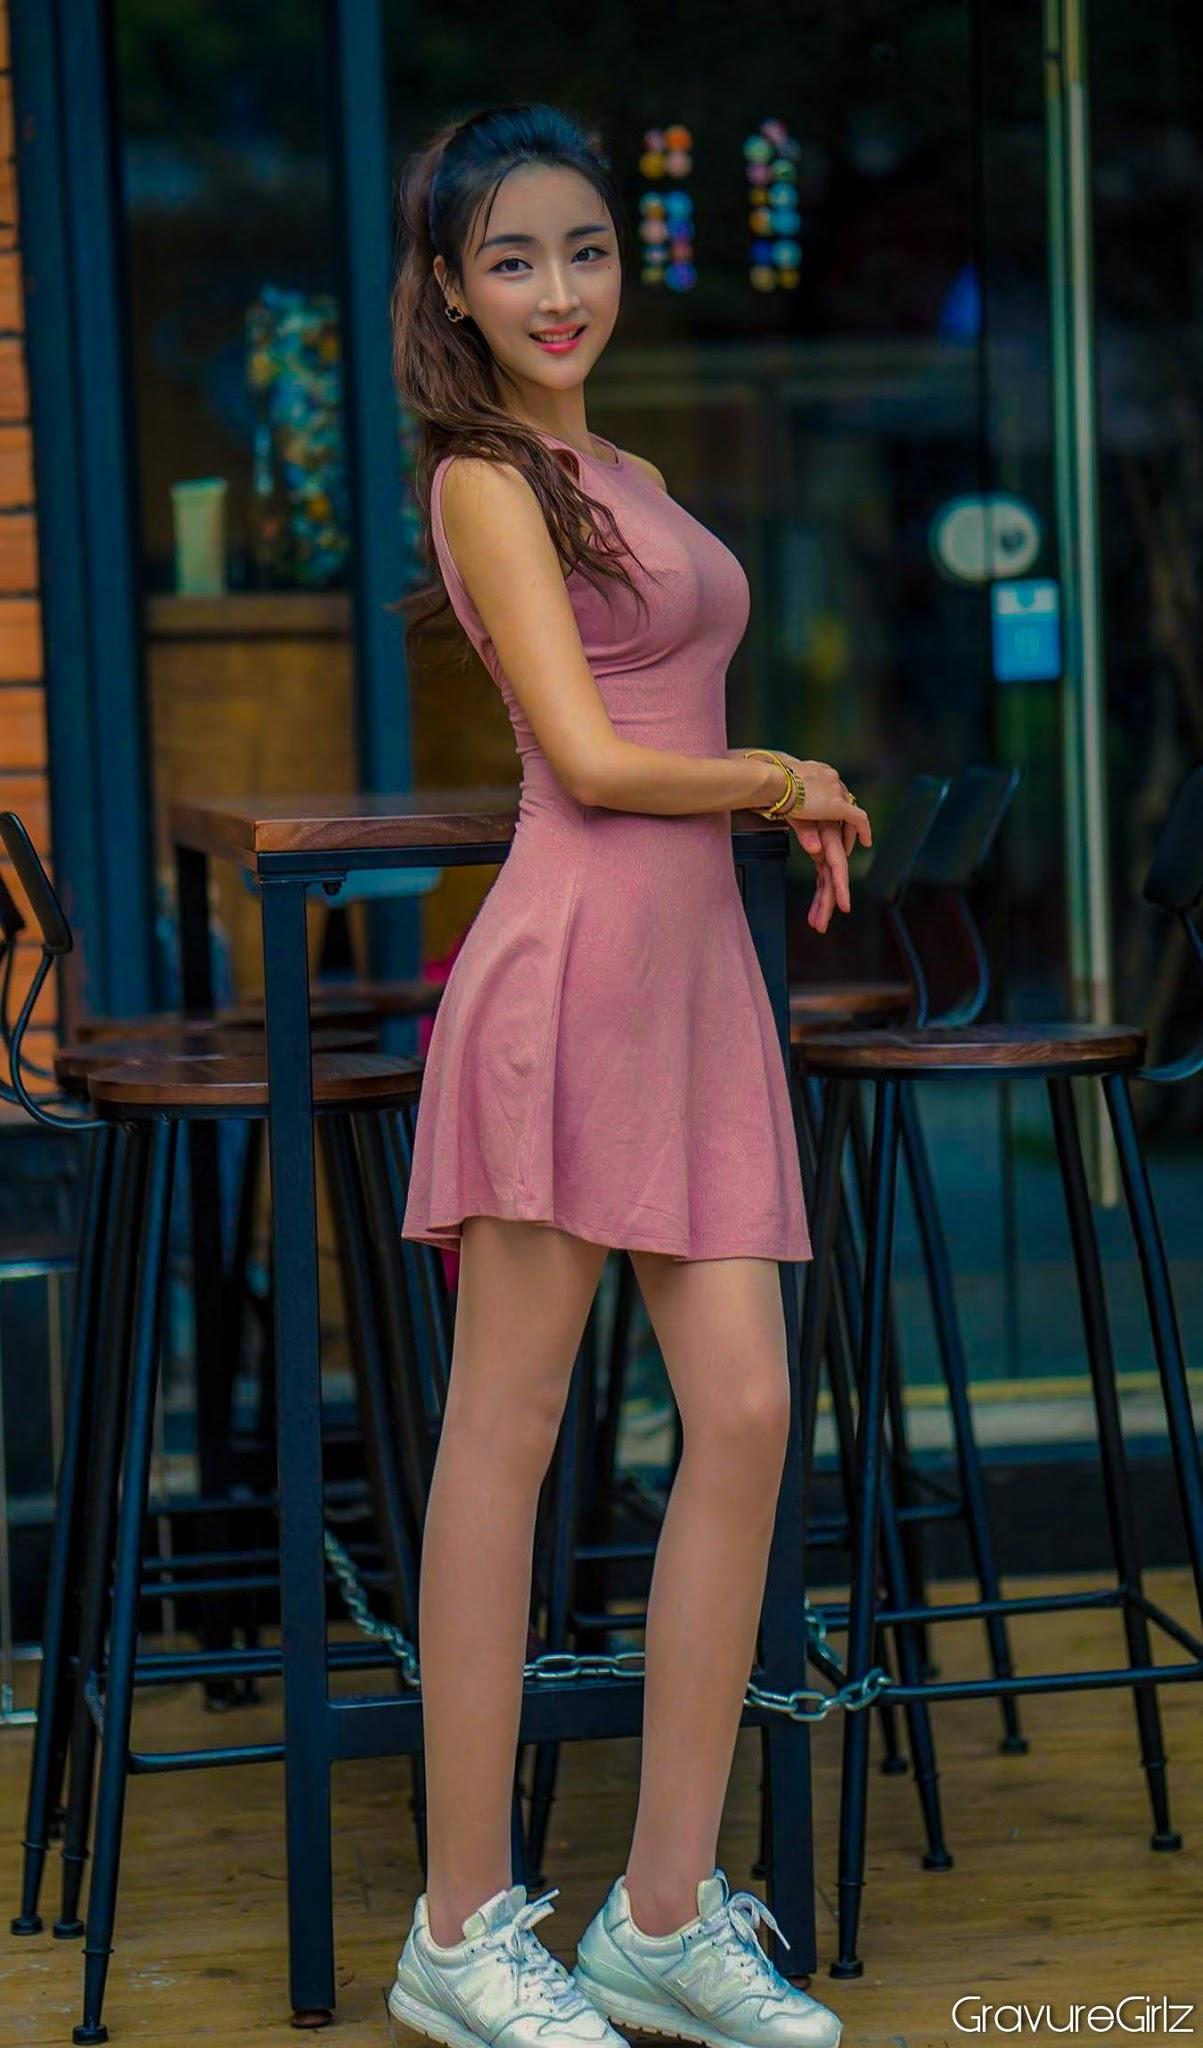 LegBaby Vol.021 李丽莎 Lisha Li 完美女神 | | Gravure Girls Idols